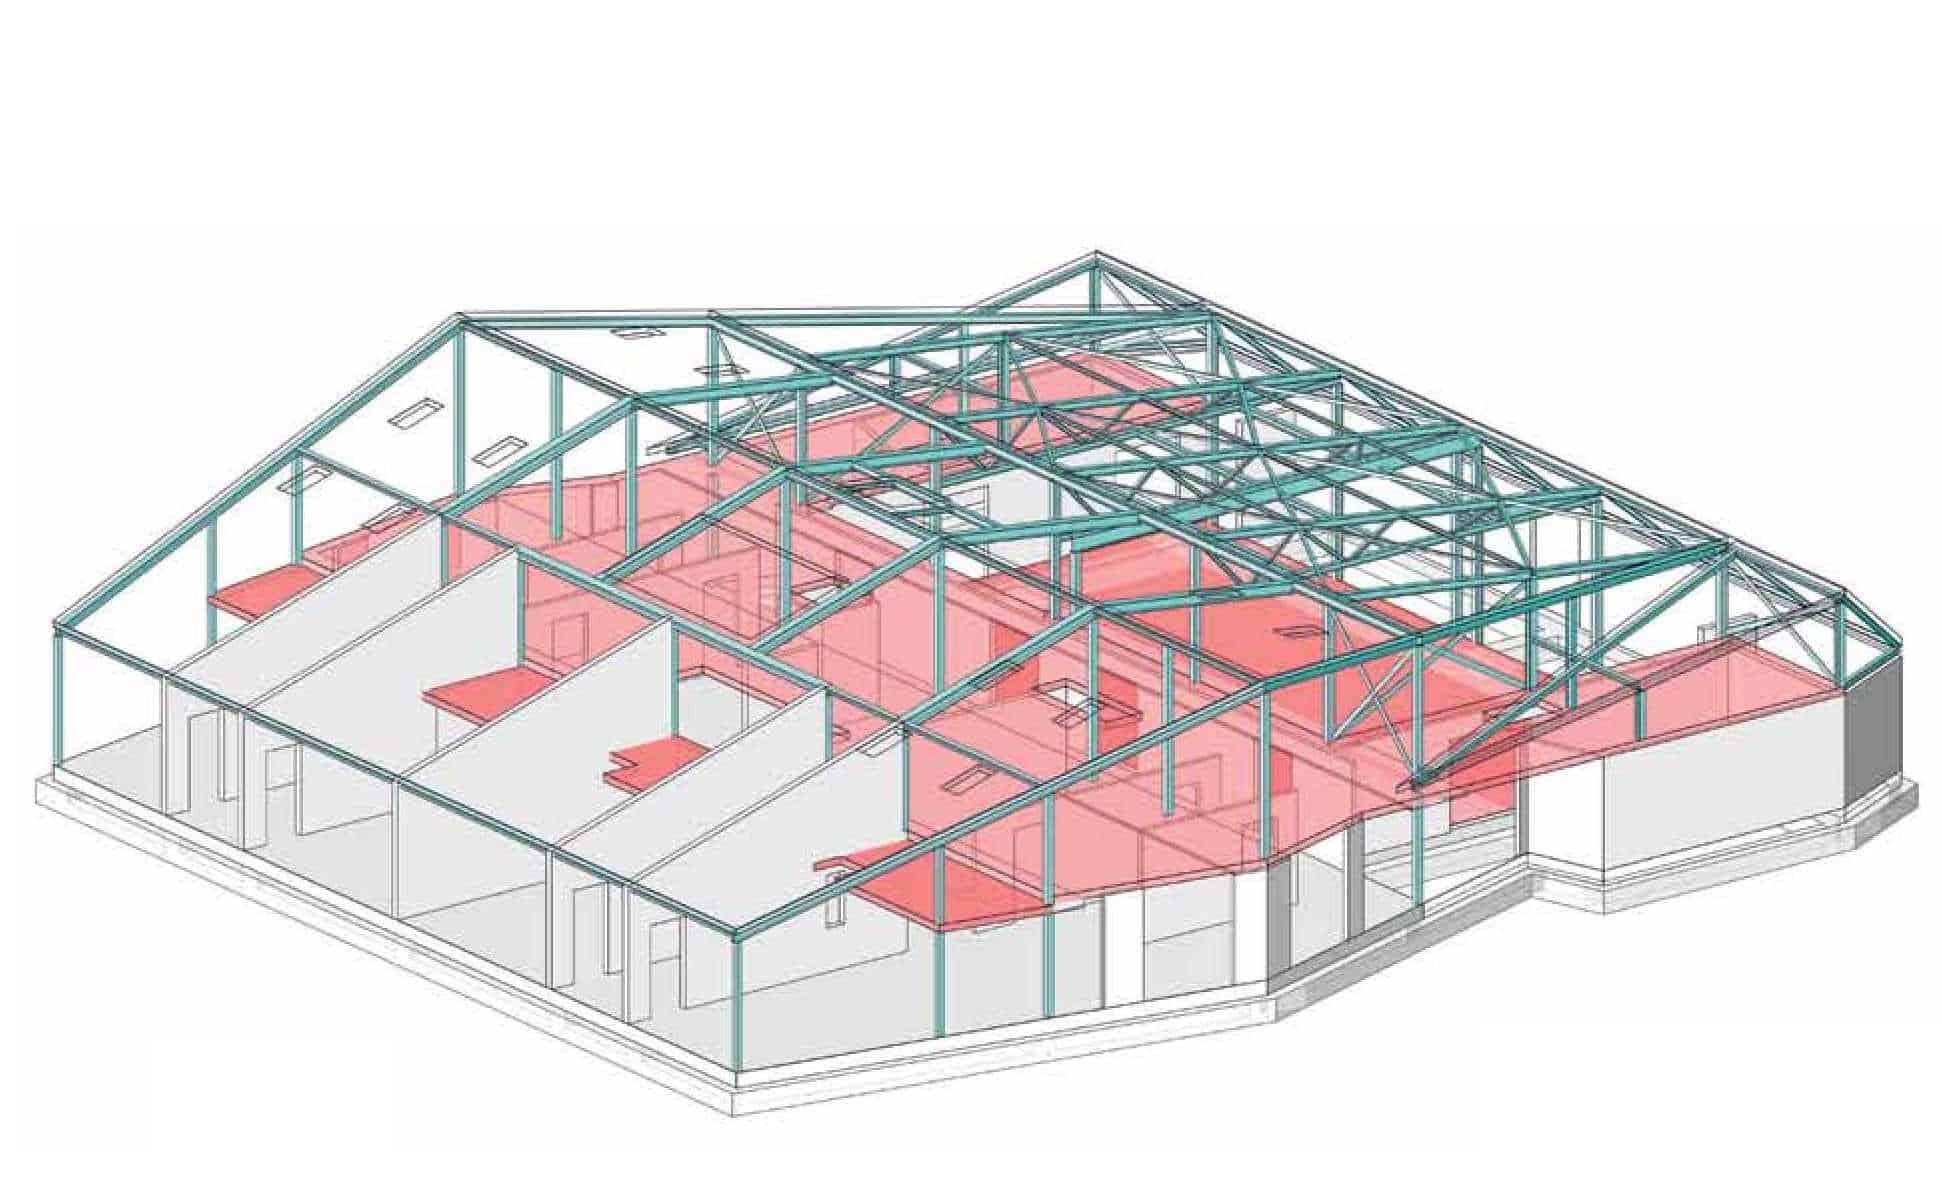 Architect_2013-12_Passiefschool-Jirnsum_th-1